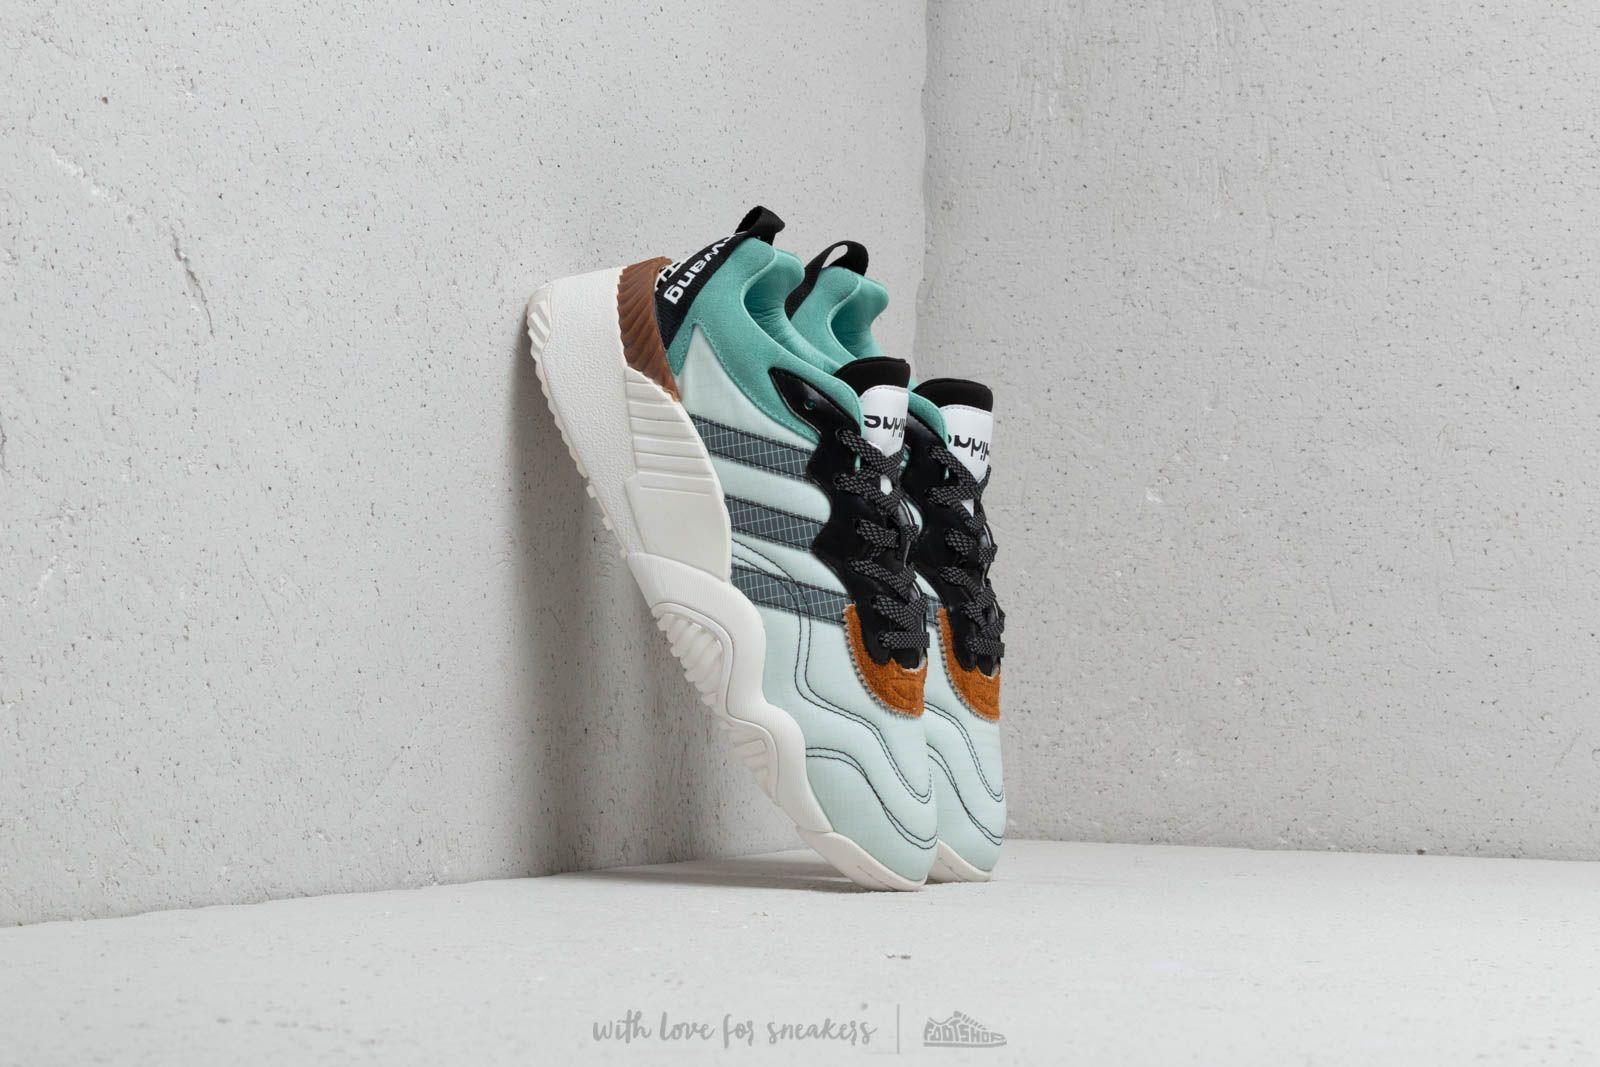 f825045e46e adidas x Alexander Wang Turnout Trainer Clear Mint/ Core Black/ Clear Mint  | Footshop